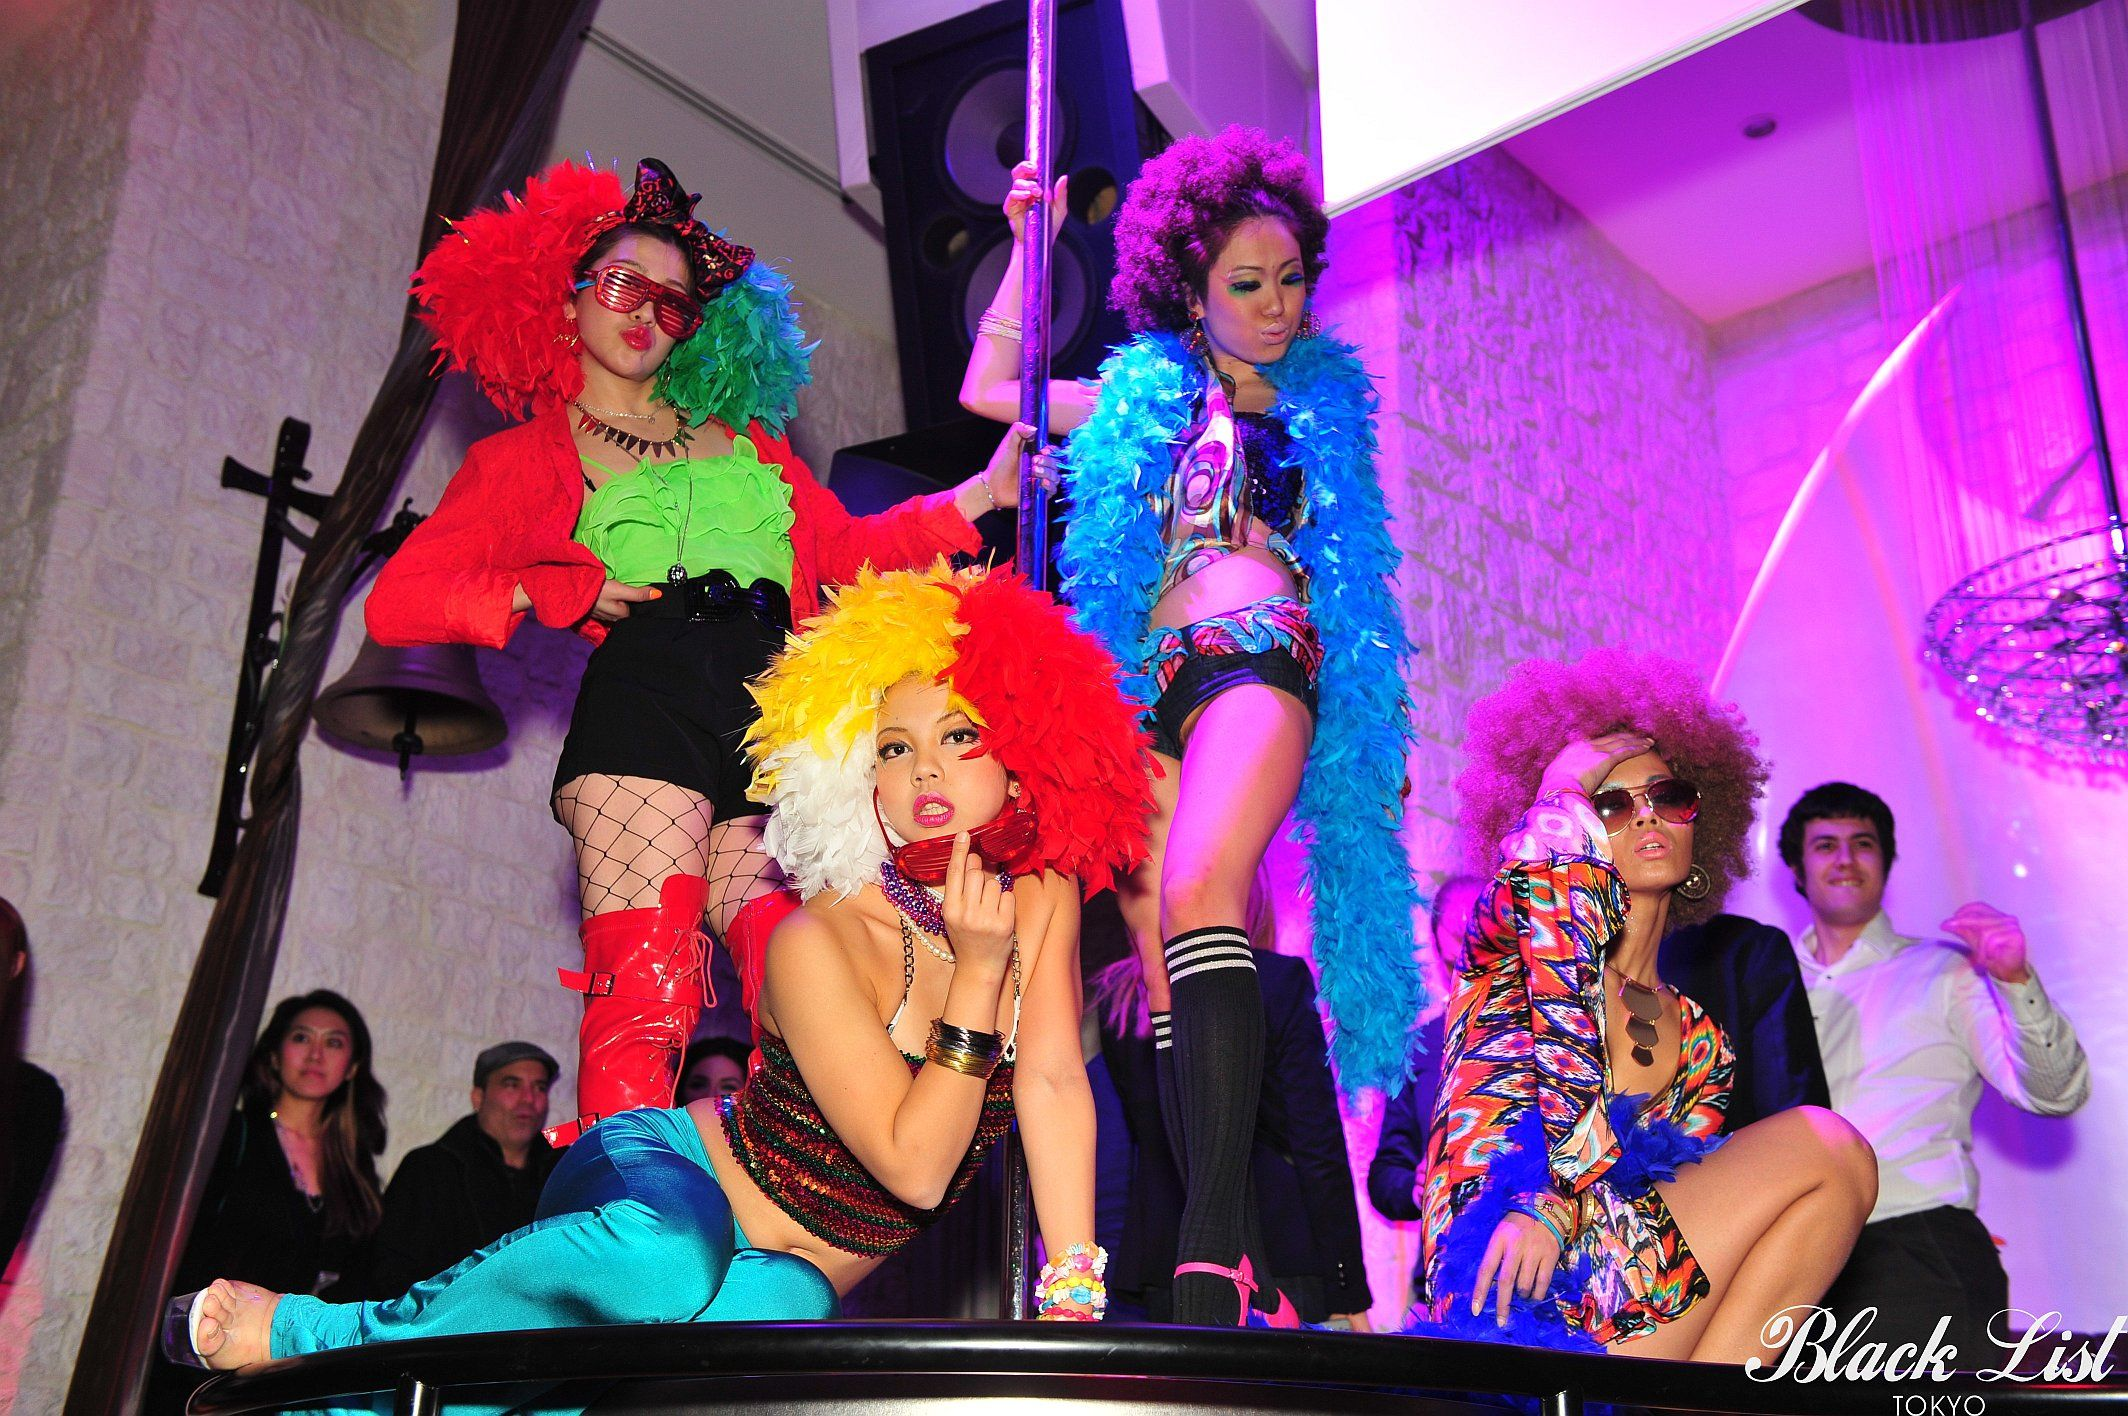 Black List Tokyo x Southern Comfort 2013 dancers #blacklist #tokyo #party #lega #fashion #southerncomfort #jackdaniels #dancers